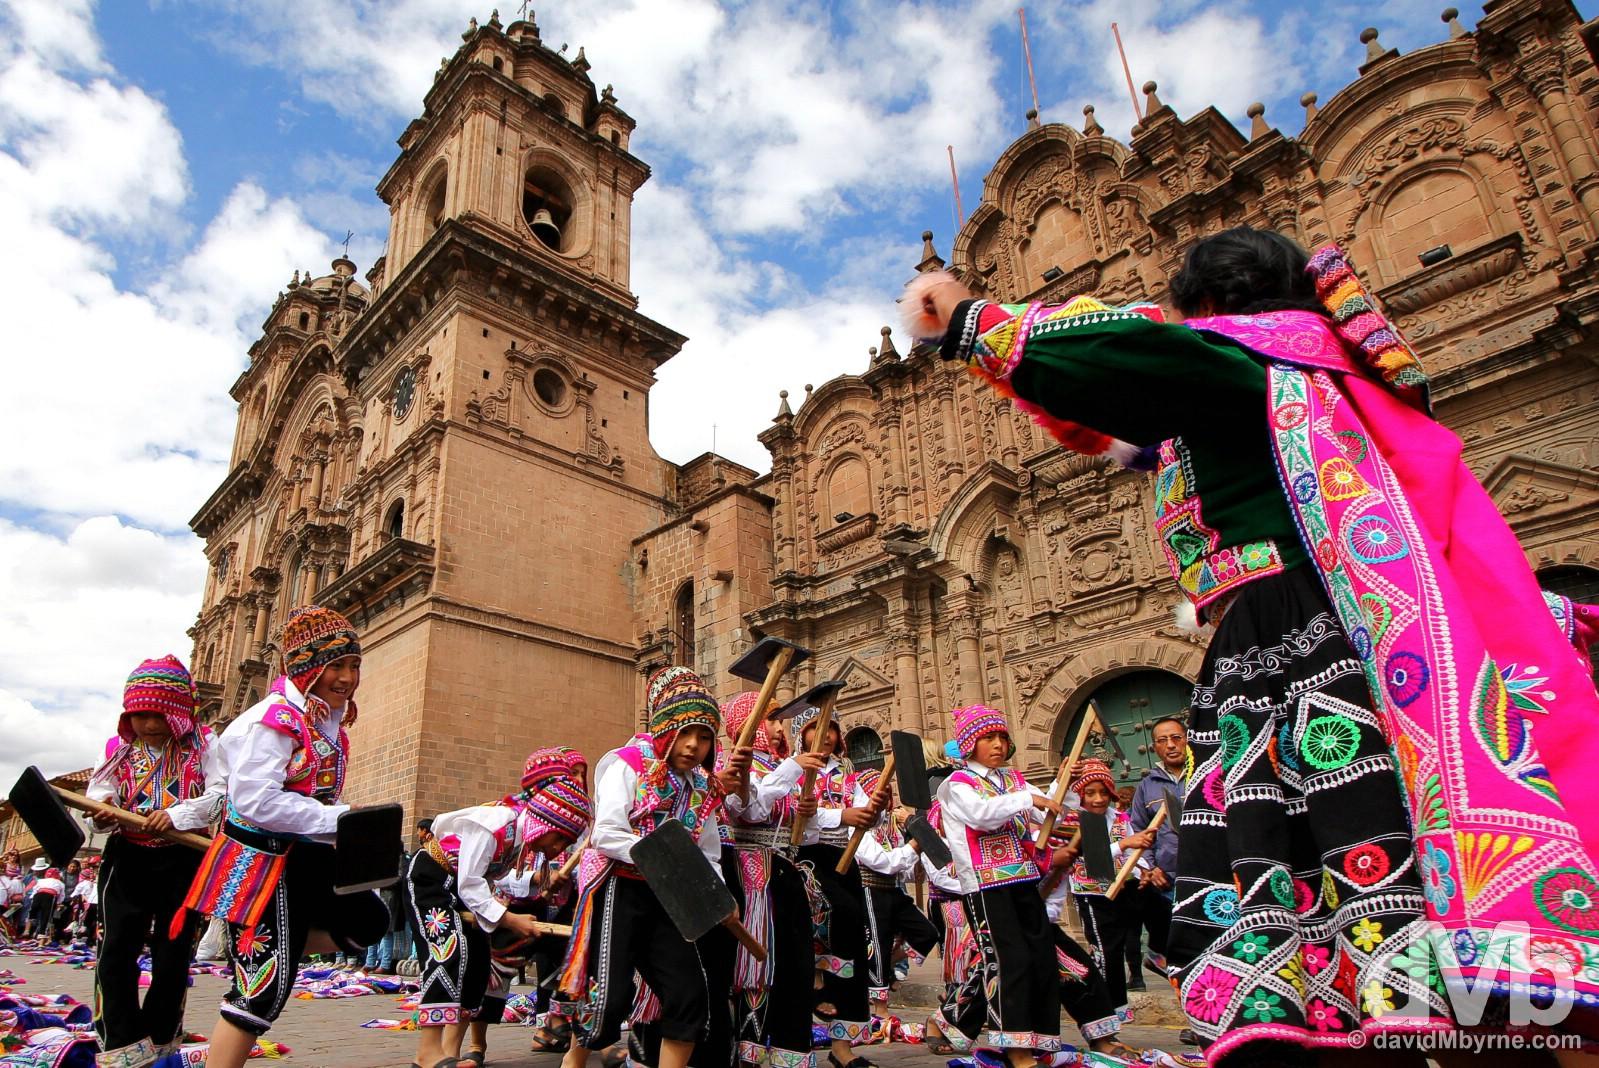 Festival activity outside the twin-towered La Compania de Jesus on Plaza de Armas, Cusco, Peru. August 16, 2015.